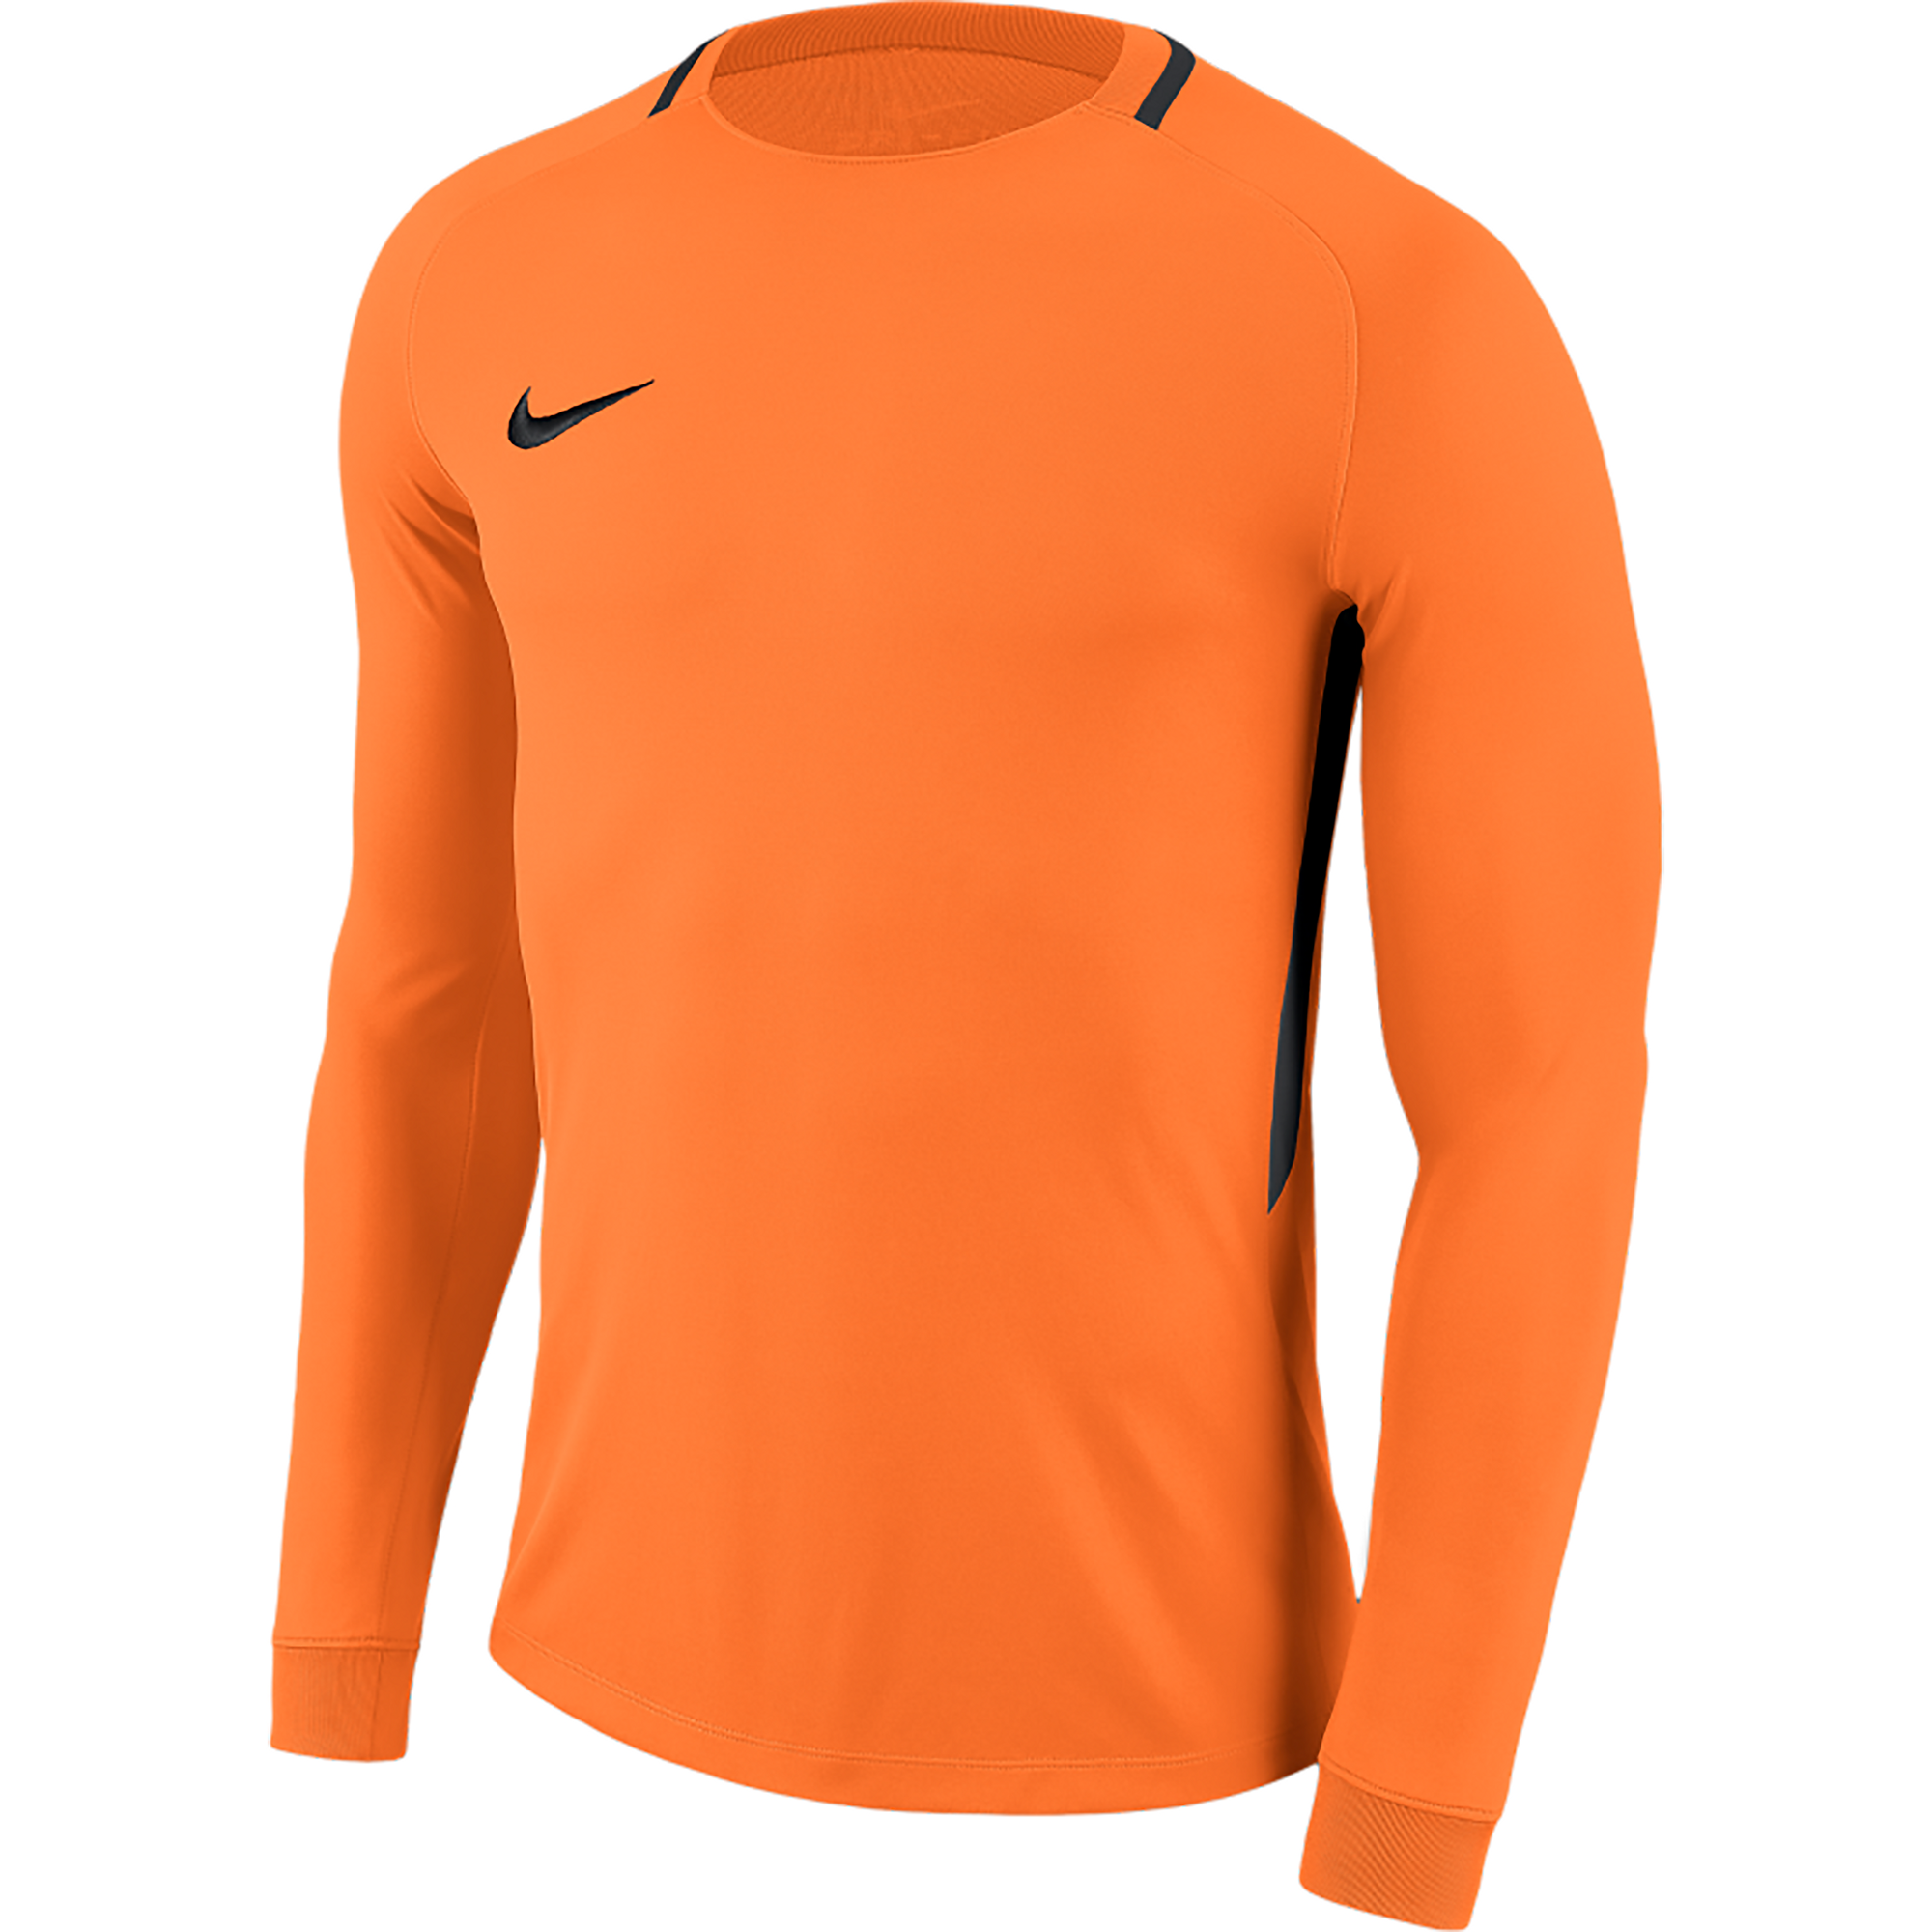 7e005401 Nike® Park Goalkeepers Shirt - Total Orange - LY | Davies Sports